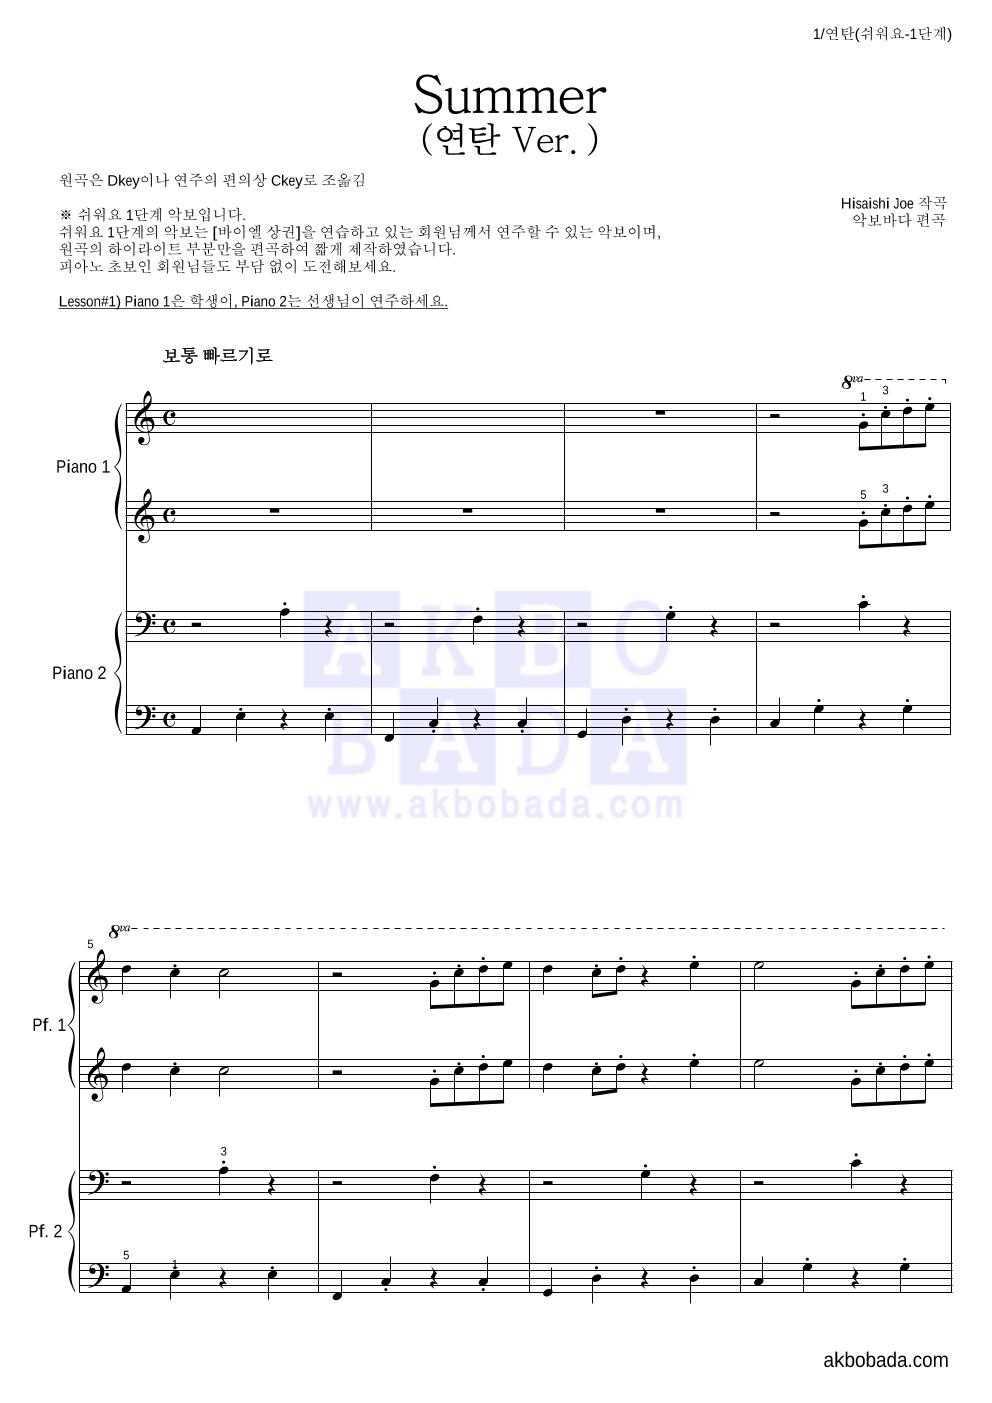 Hisaishi Joe - Summer 연탄곡-쉬워요 악보